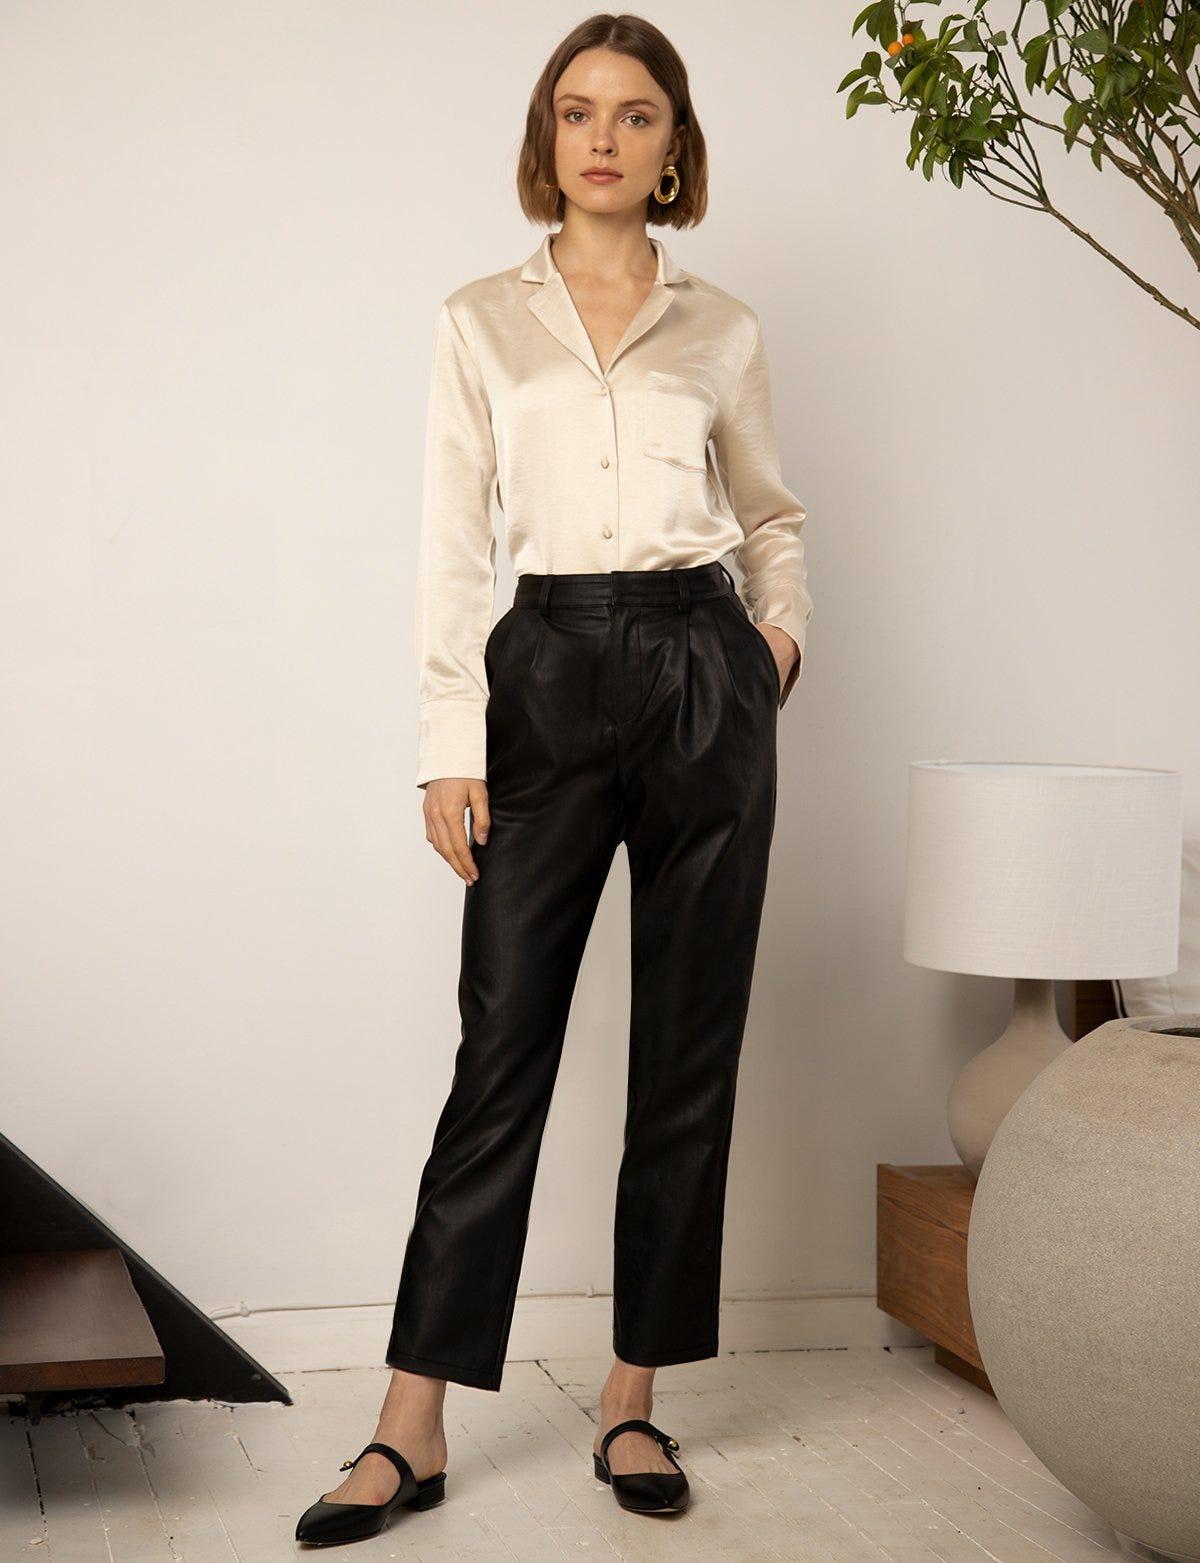 629e1604e32 Leather Pants Trend Spring 2019